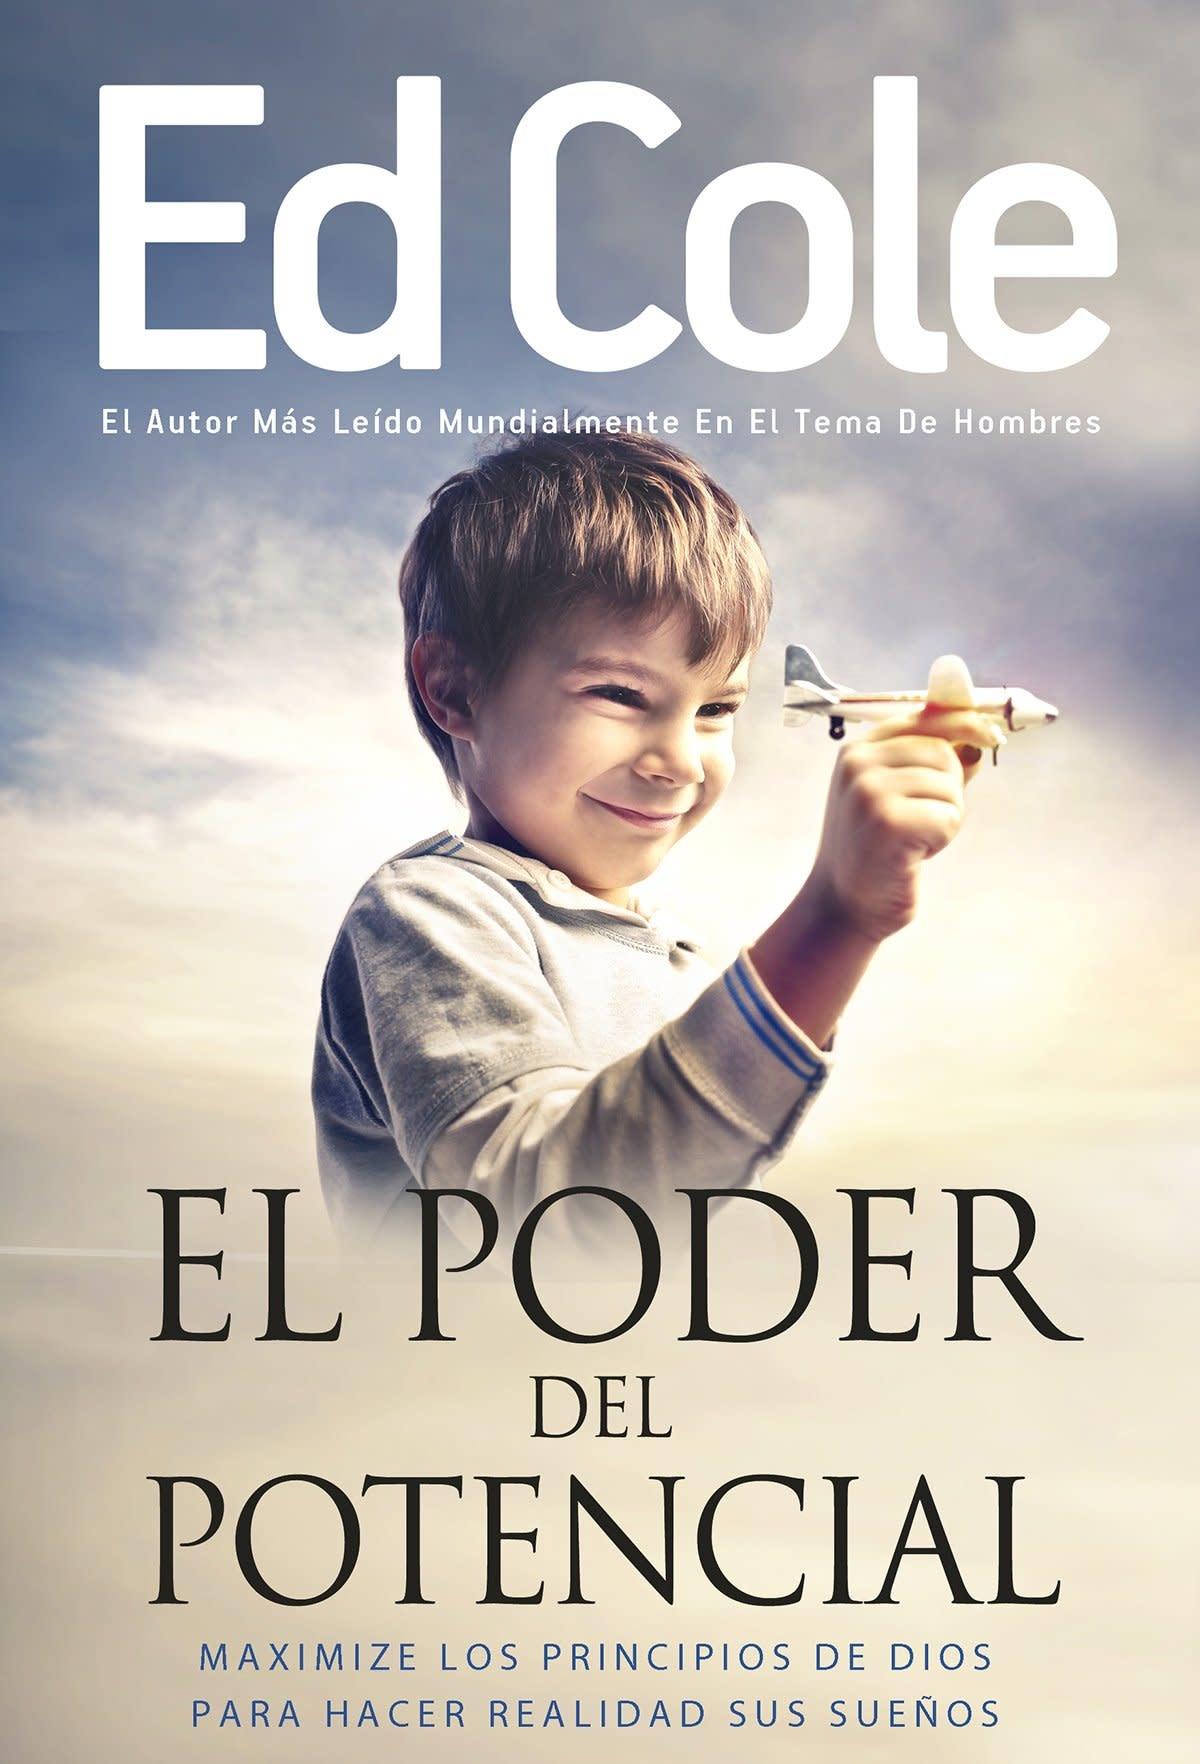 El Poder Del Potencial Book by Ed Cole The Power of Potential-1